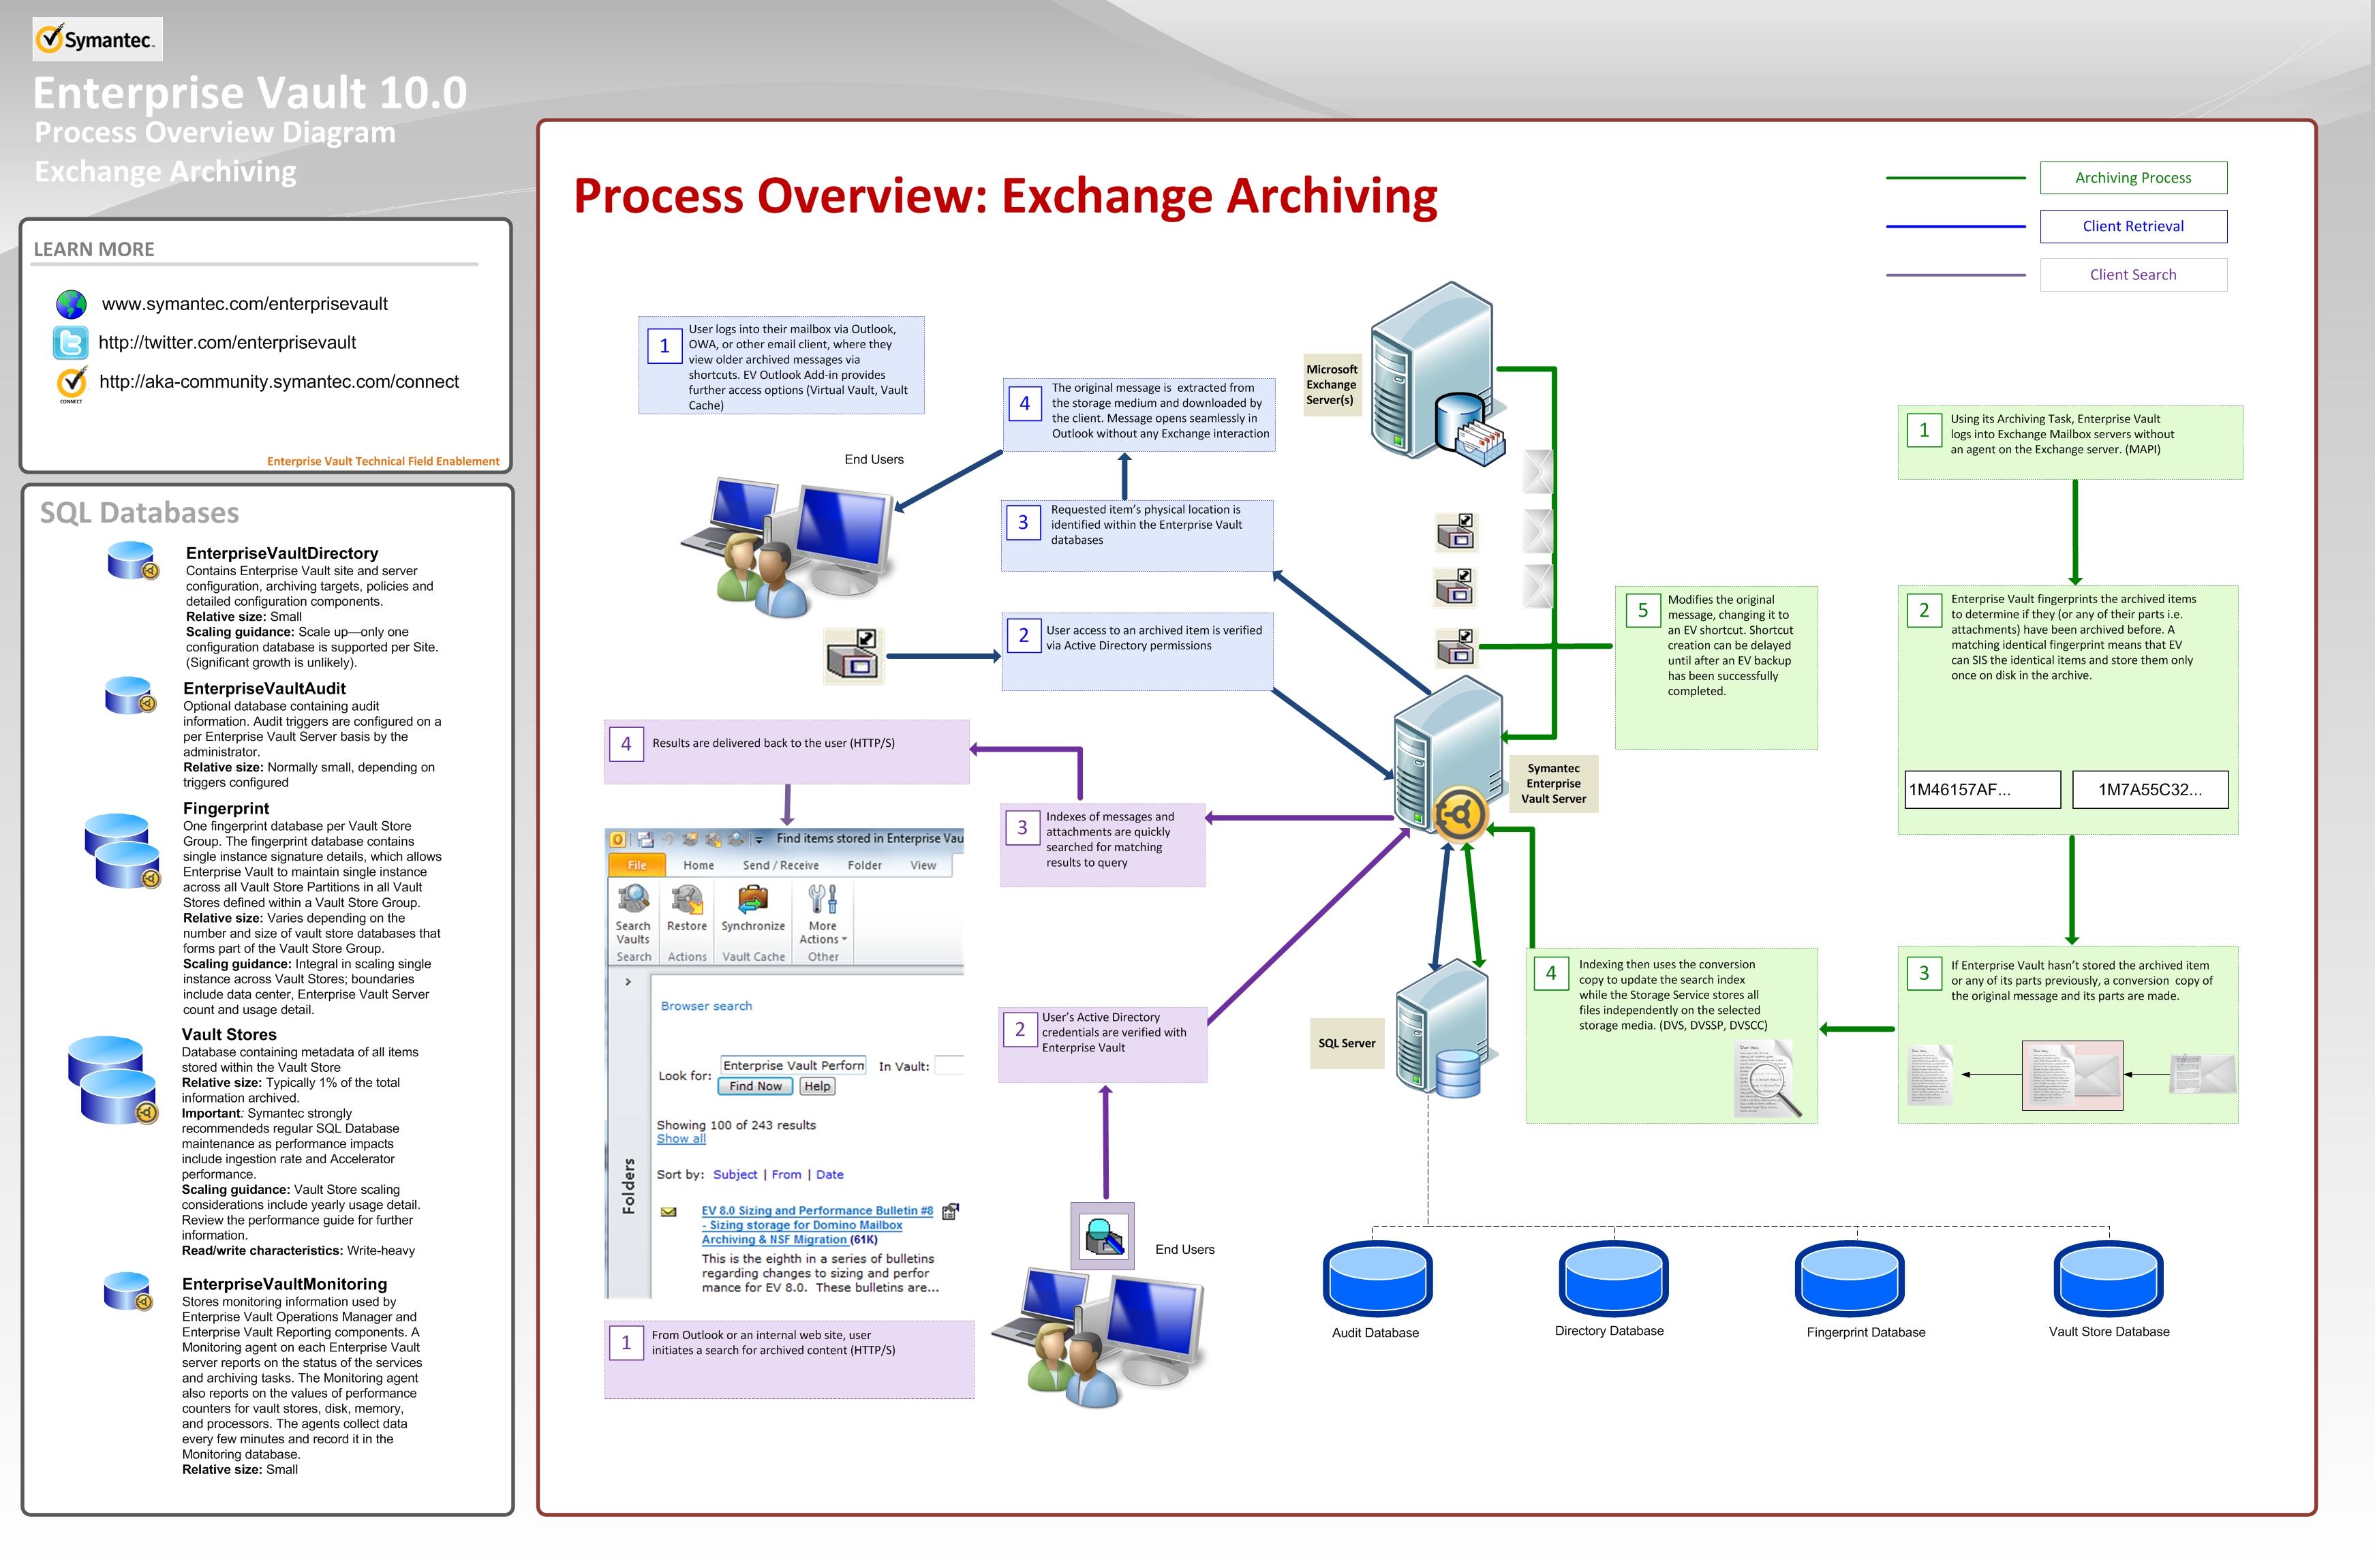 service process diagram gorilla life cycle irs archive vault pronk pops